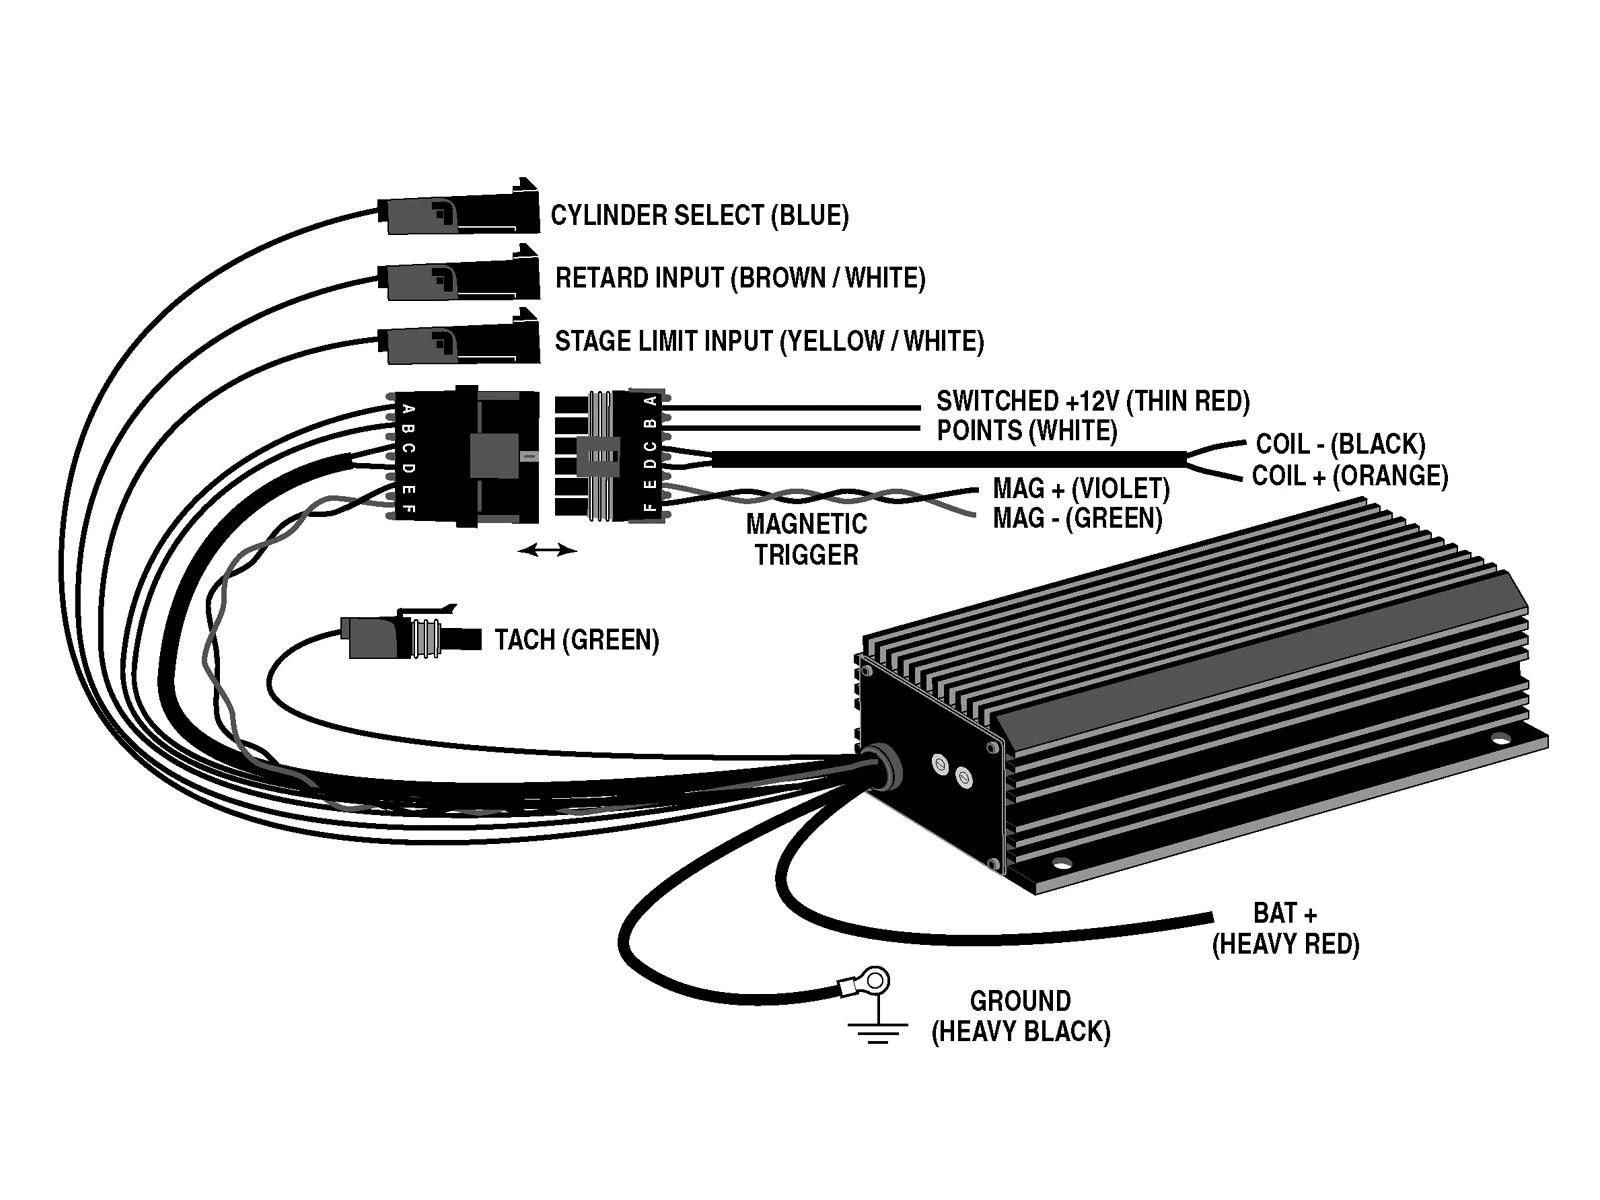 medium resolution of crane hi 6r capacitive discharge ignition 5 0 mustang super fords crane hi 6 wiring diagram